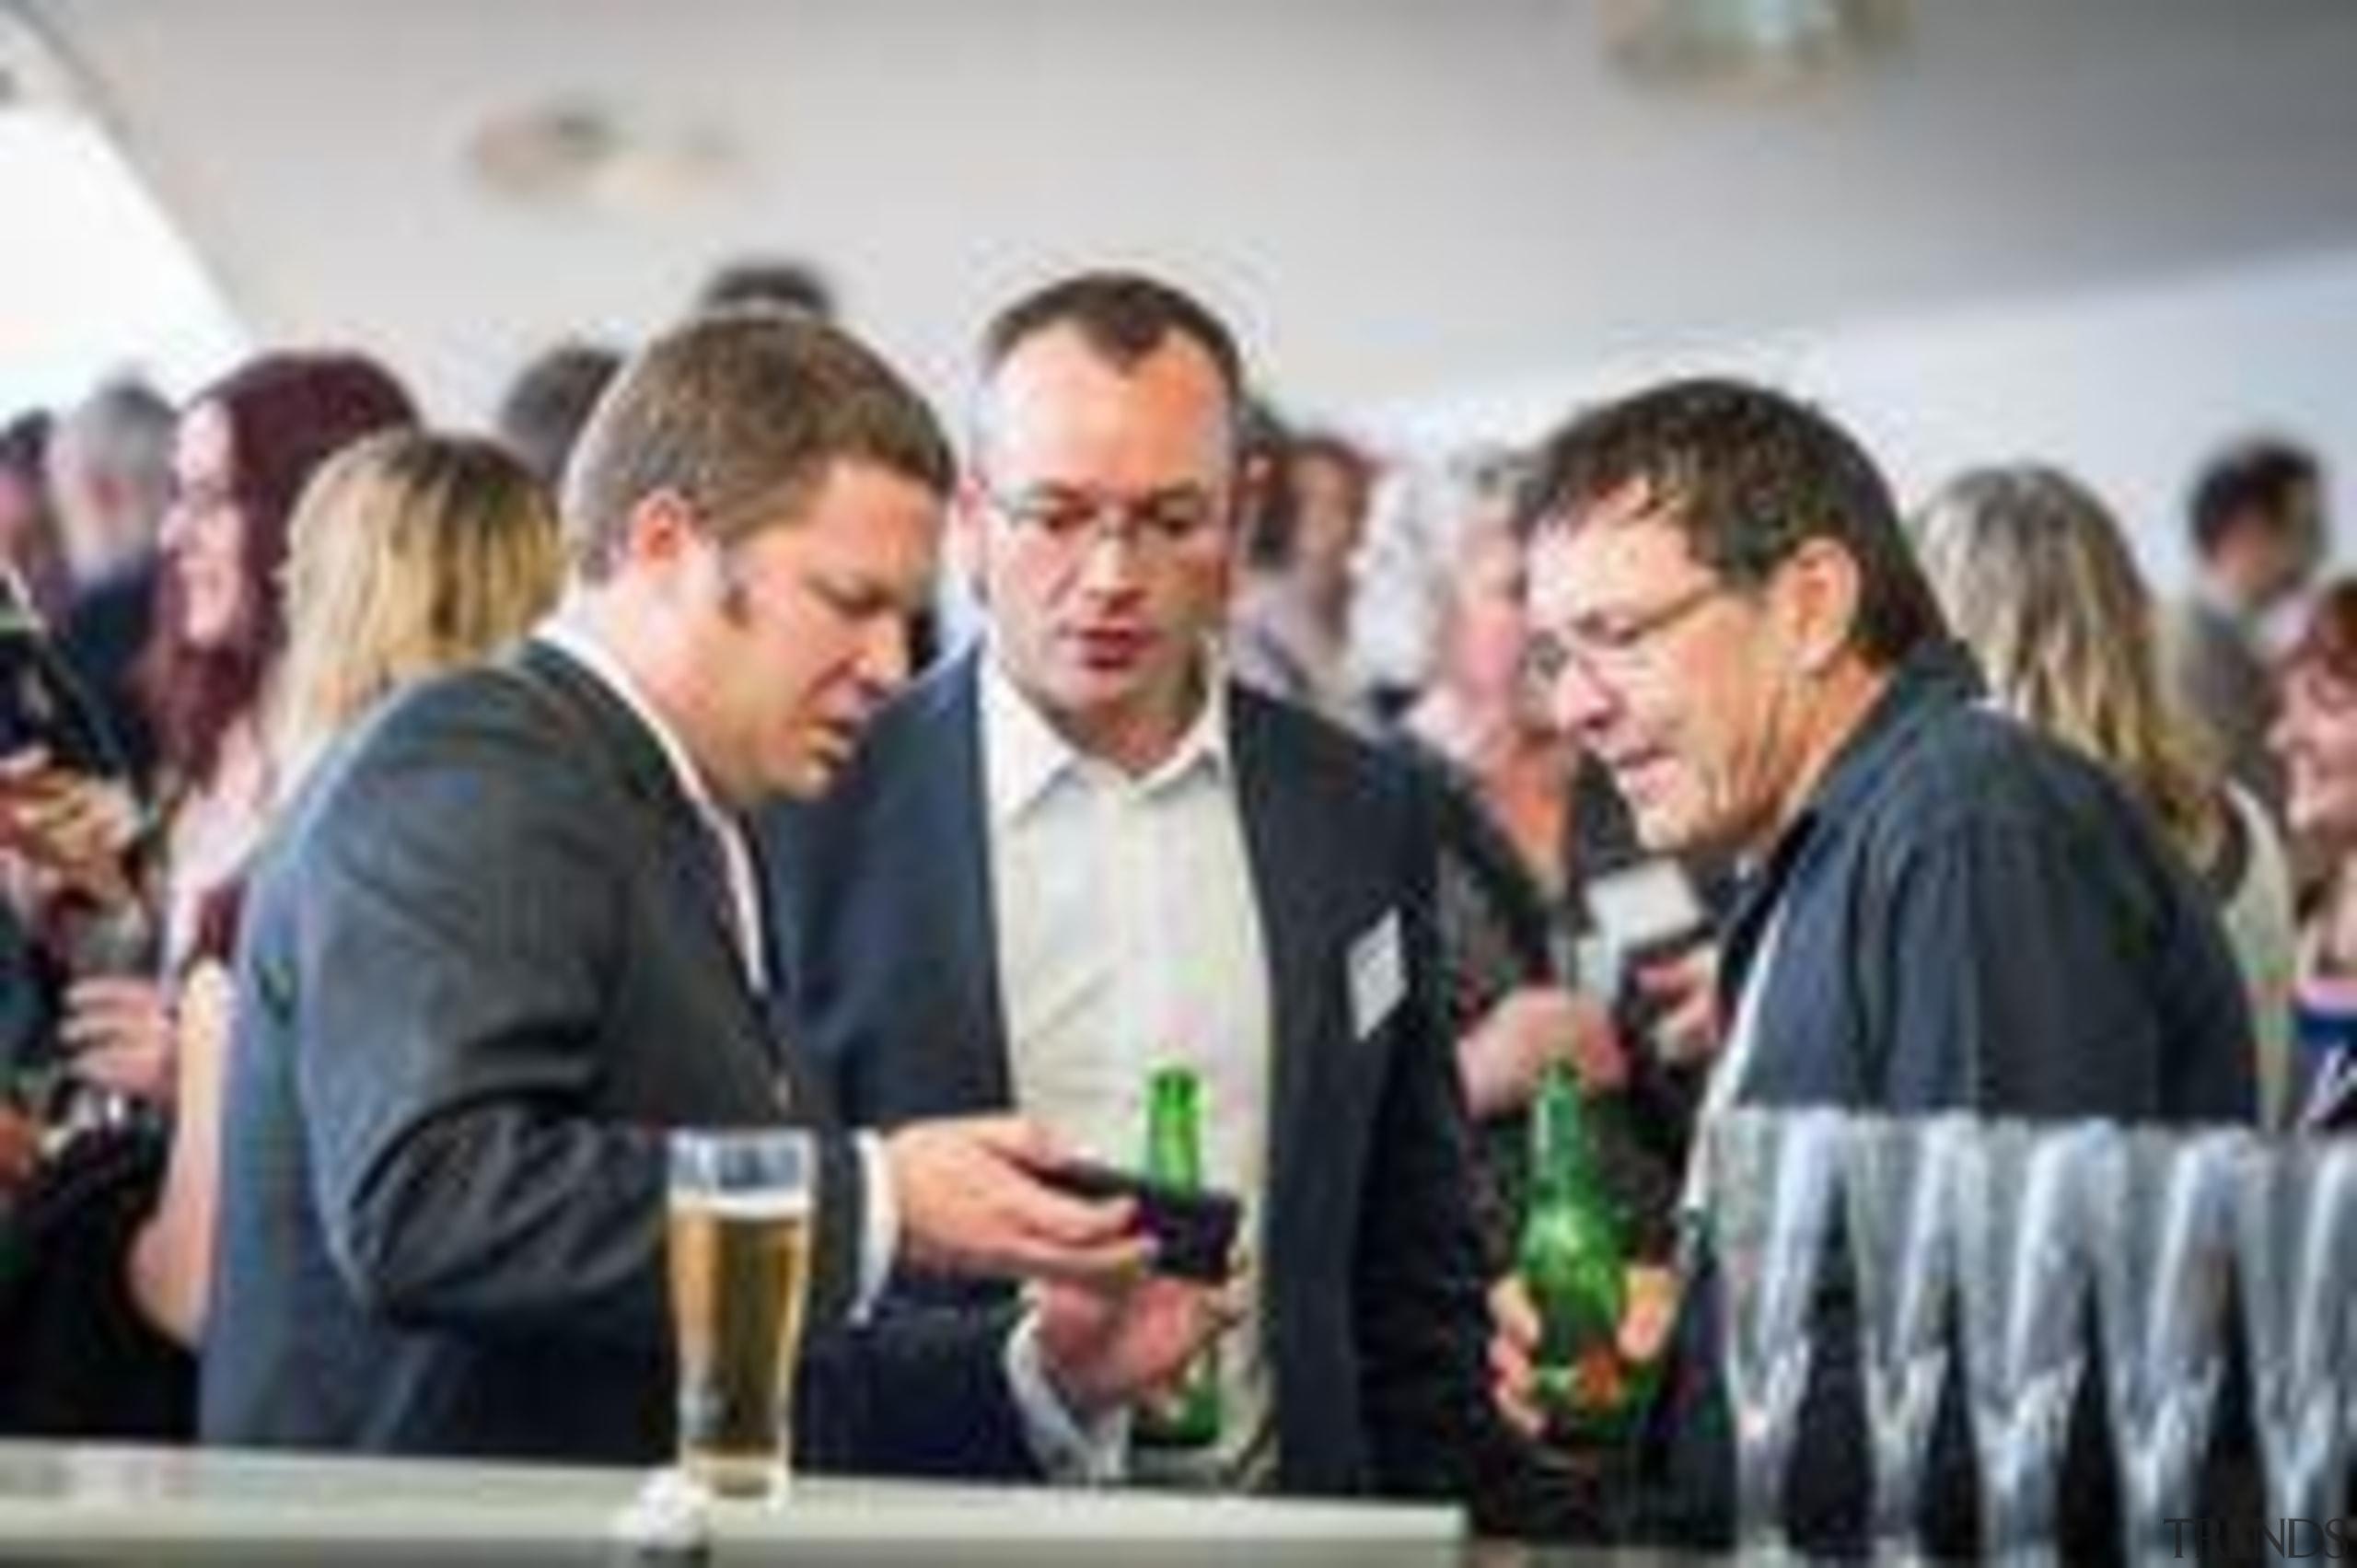 Matteo Messorri, Laminam Italy; Murray Christensen, Laminex New alcoholic beverage, communication, distilled beverage, drink, event, gray